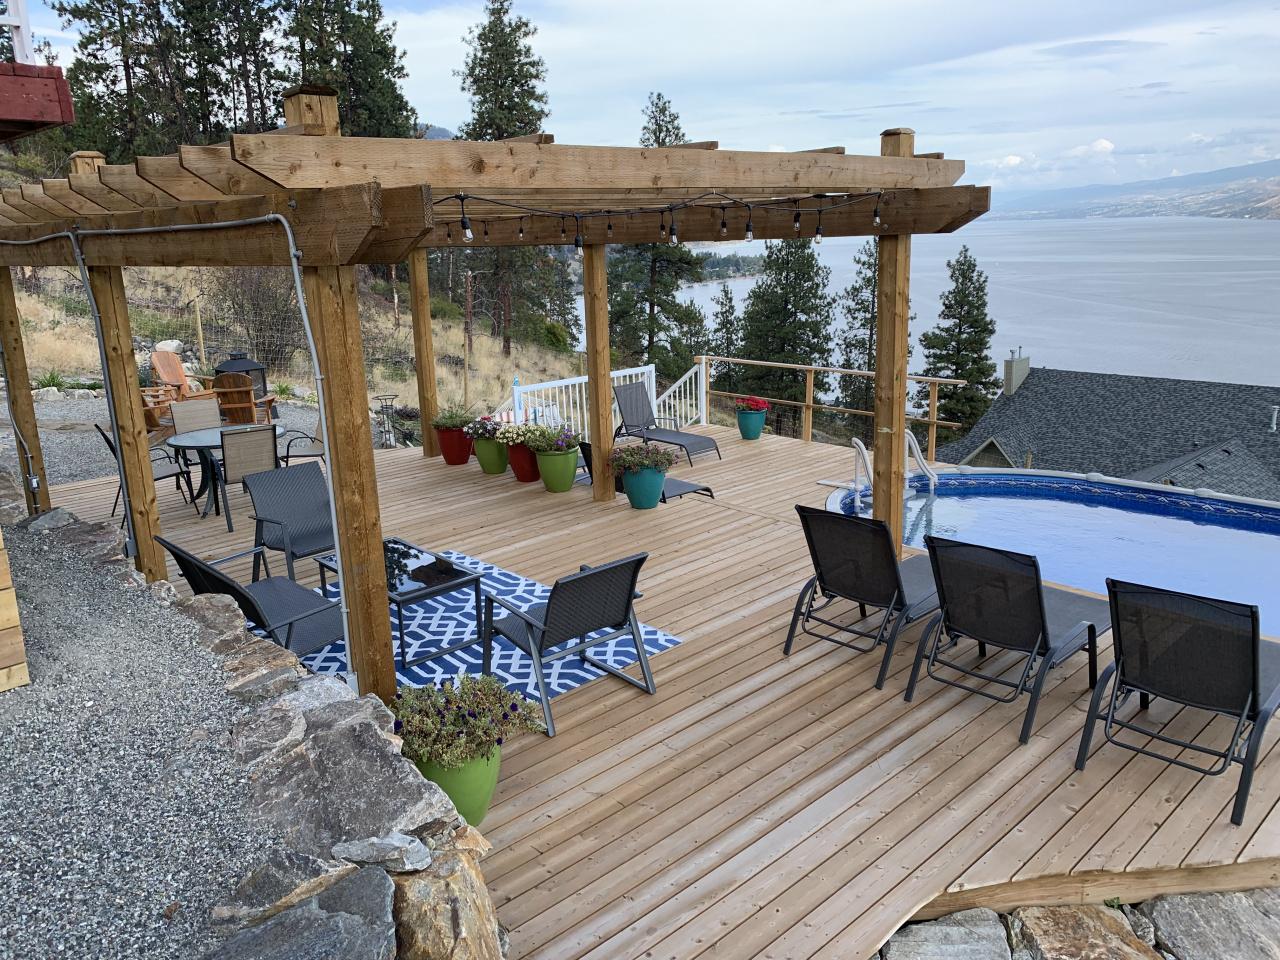 Deck & Pergola overlooking pool